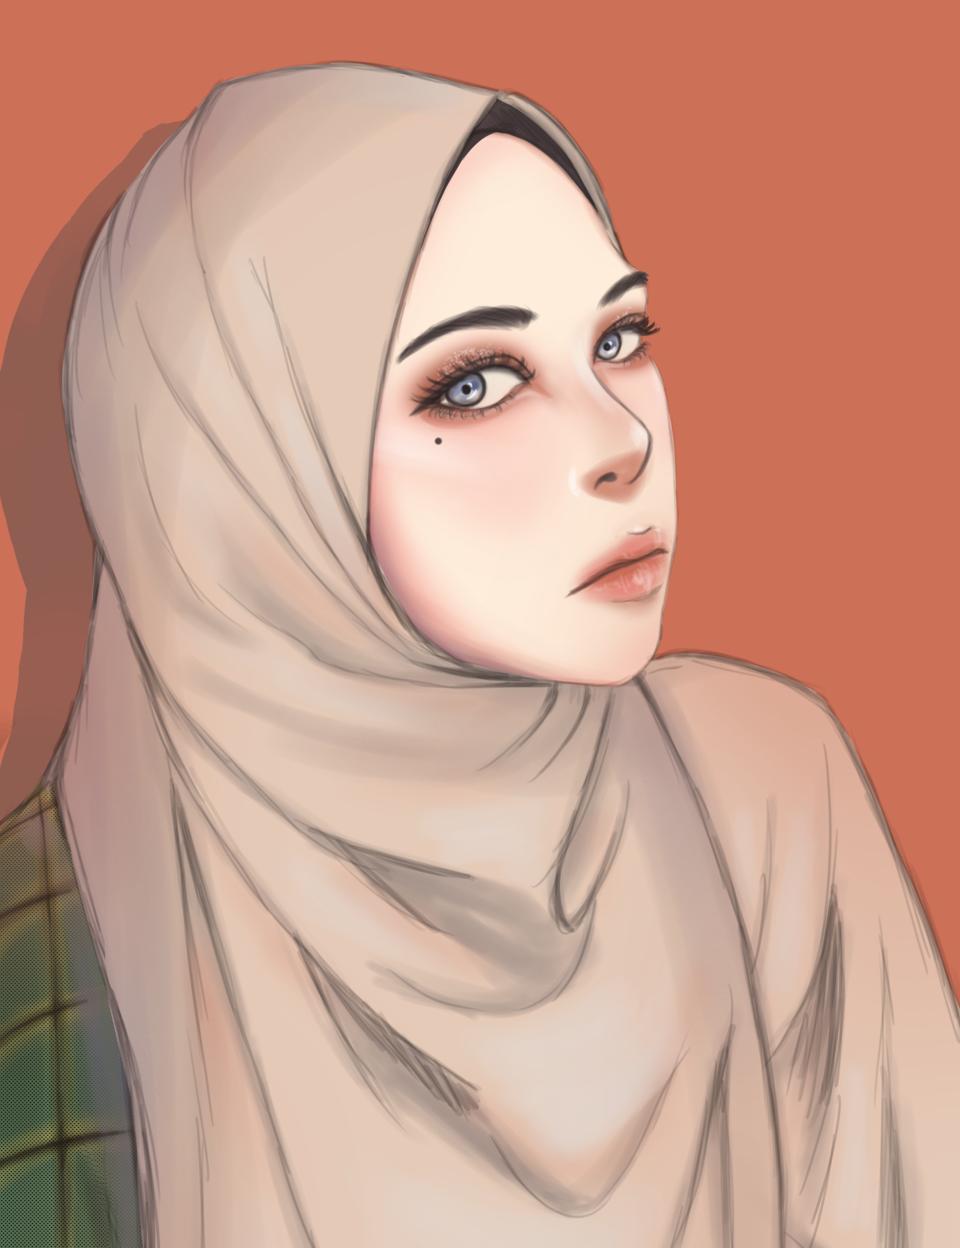 Girl with hijab Illust of Veraaa September2021_Girl anime girl Islam animegirl medibangpaint art eyes contest